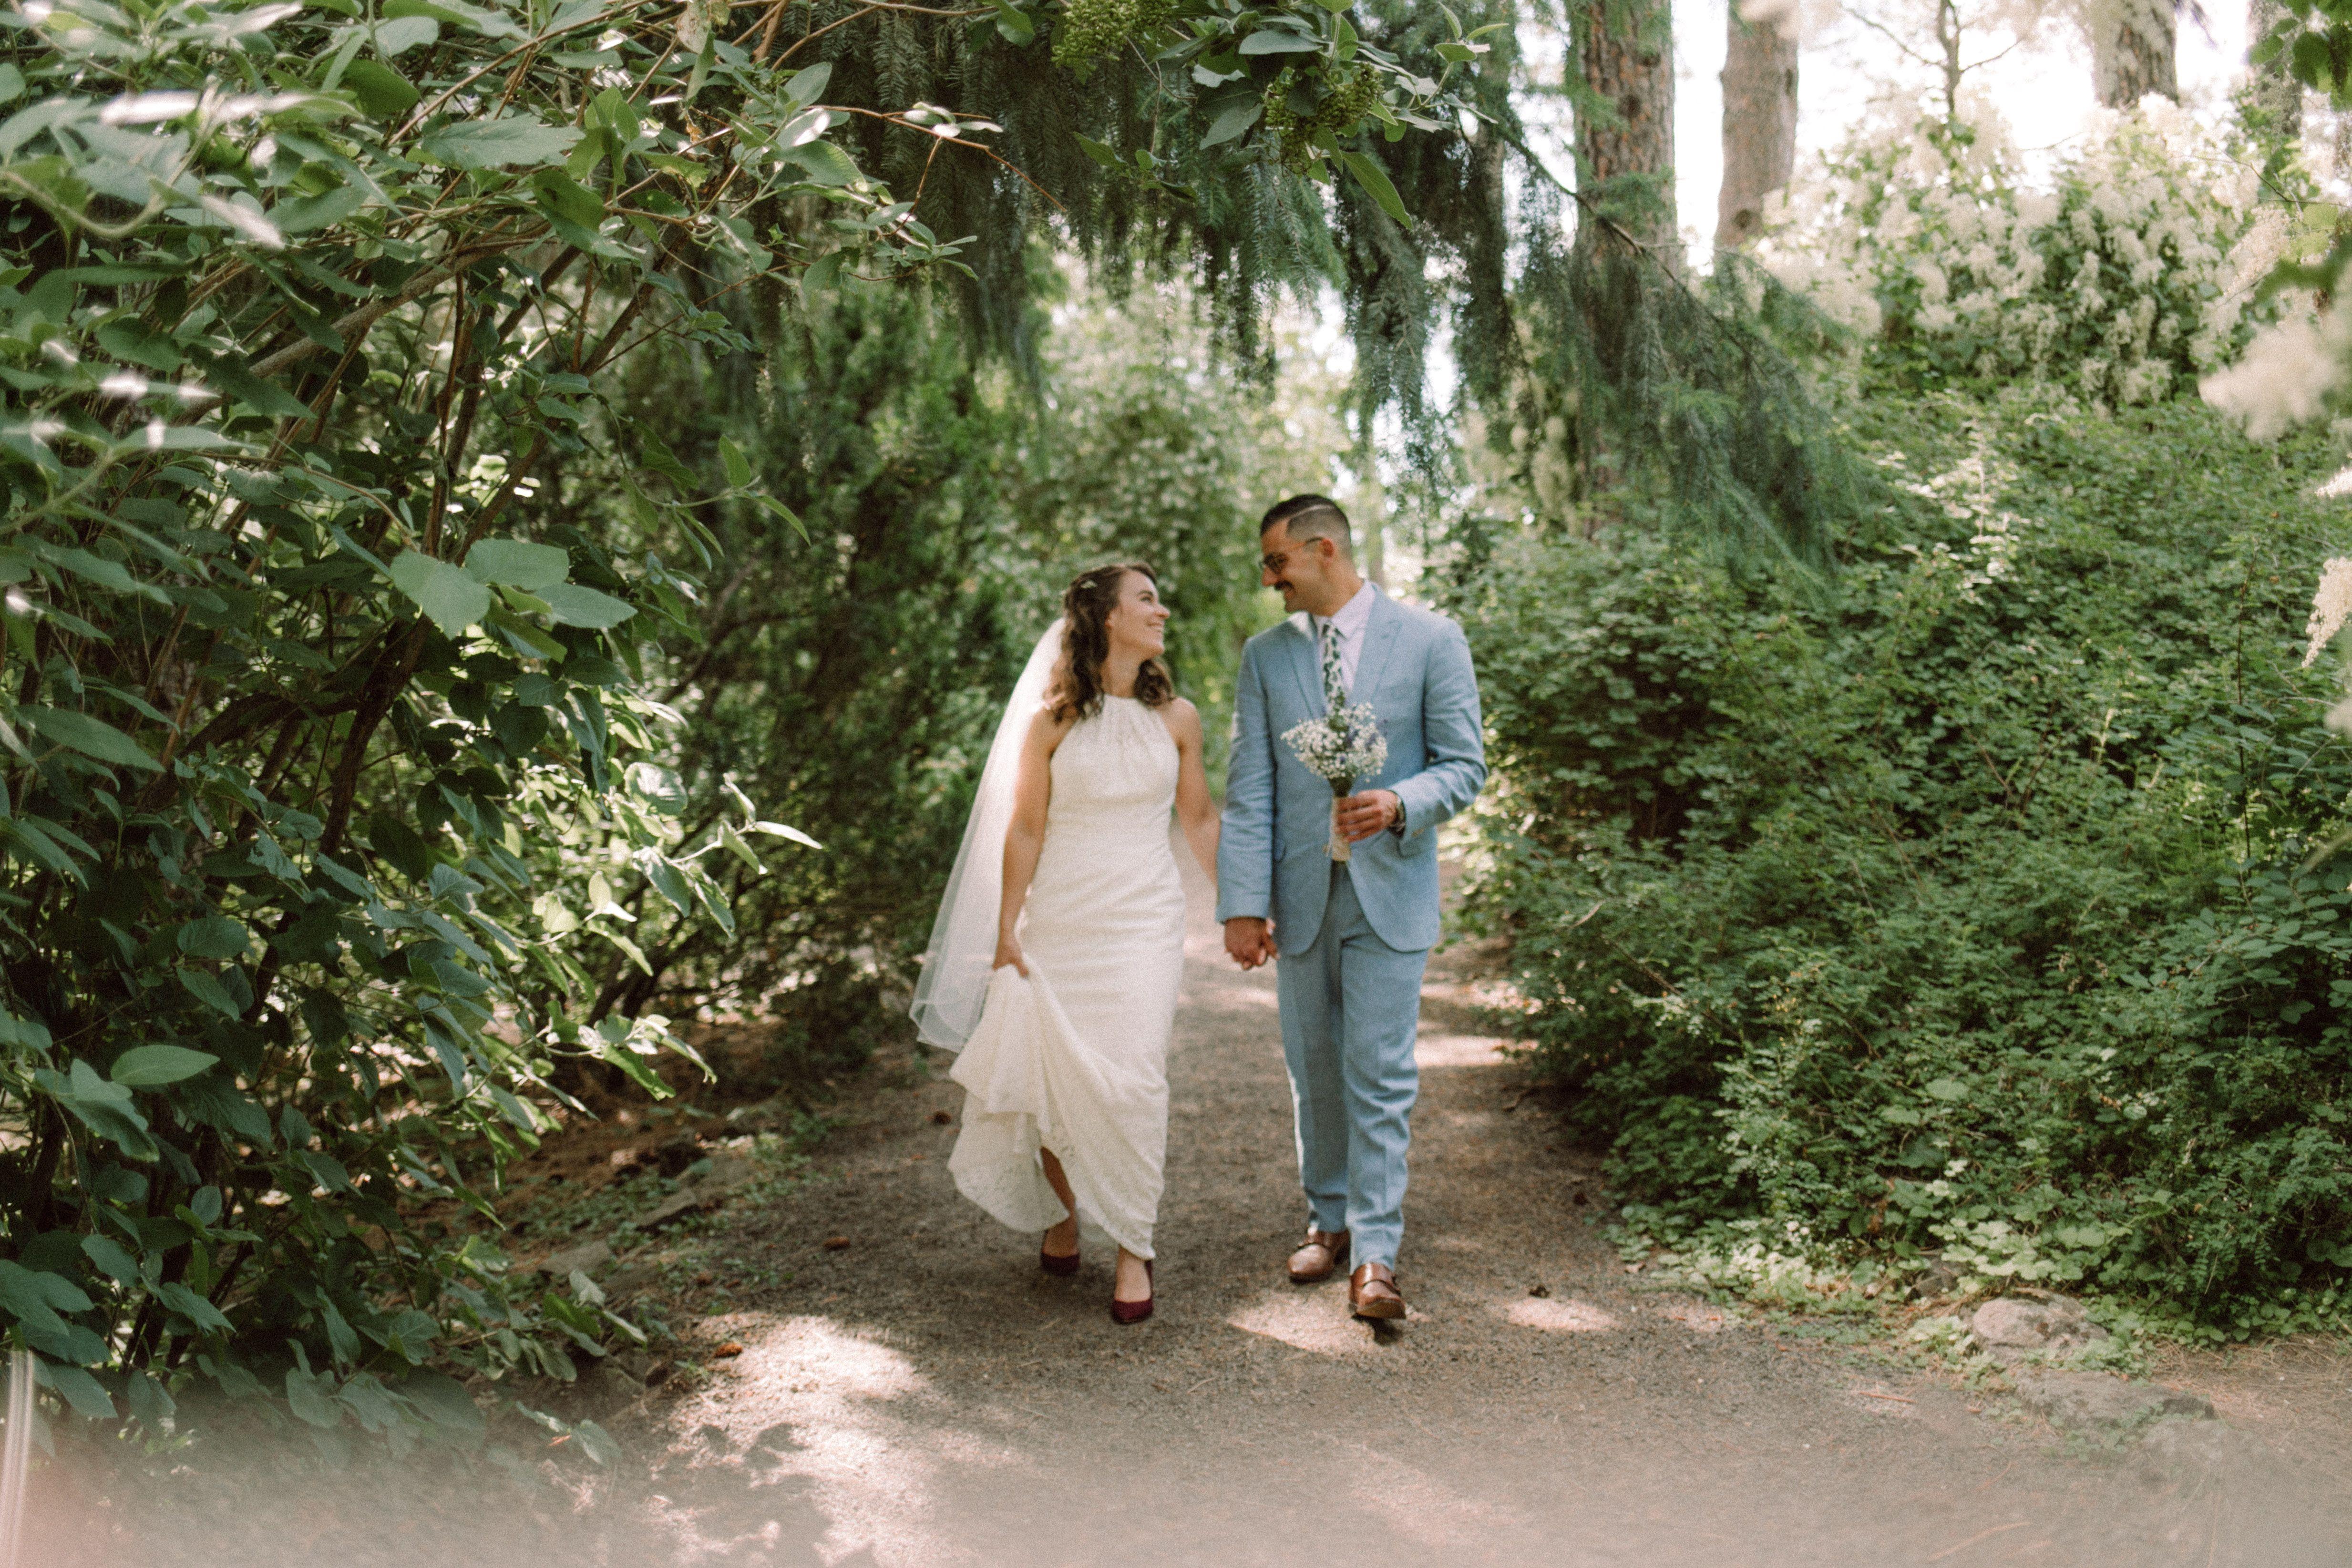 Manito Park Wedding Spokane Wa Photography And Videography Photojournalistic Park Weddings